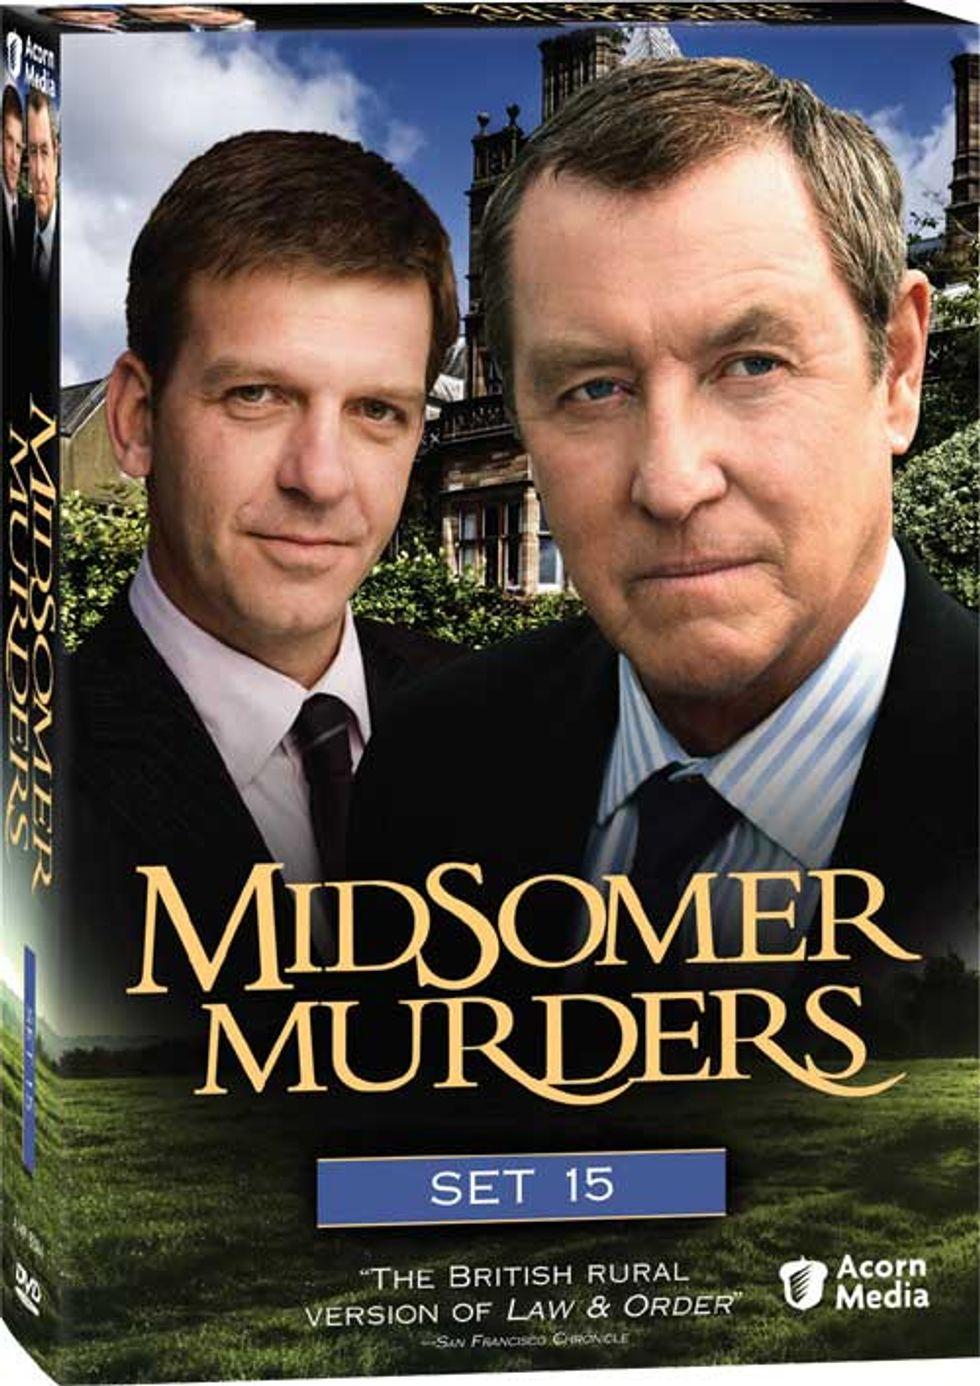 Midsomer Murders Set 15 On DVD!